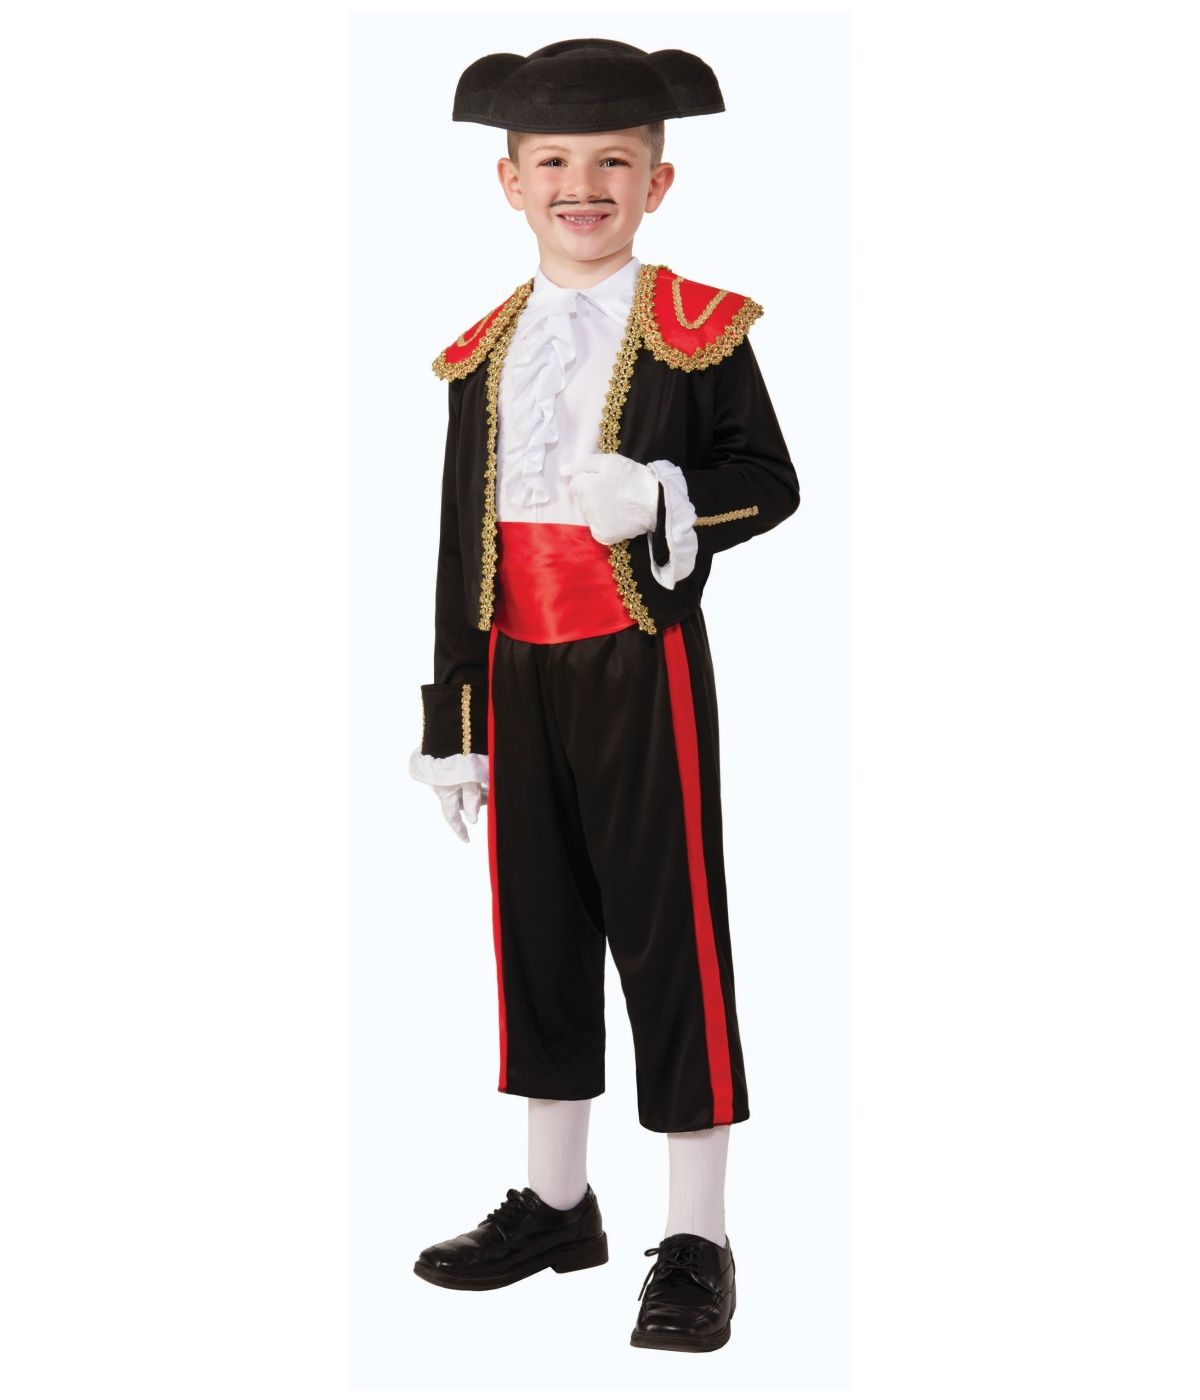 Sr Matador Boys Spanish Bullfighter Costume  sc 1 st  Halloween Costumes & Sr Matador Boys Spanish Bullfighter Costume - Sport Costumes